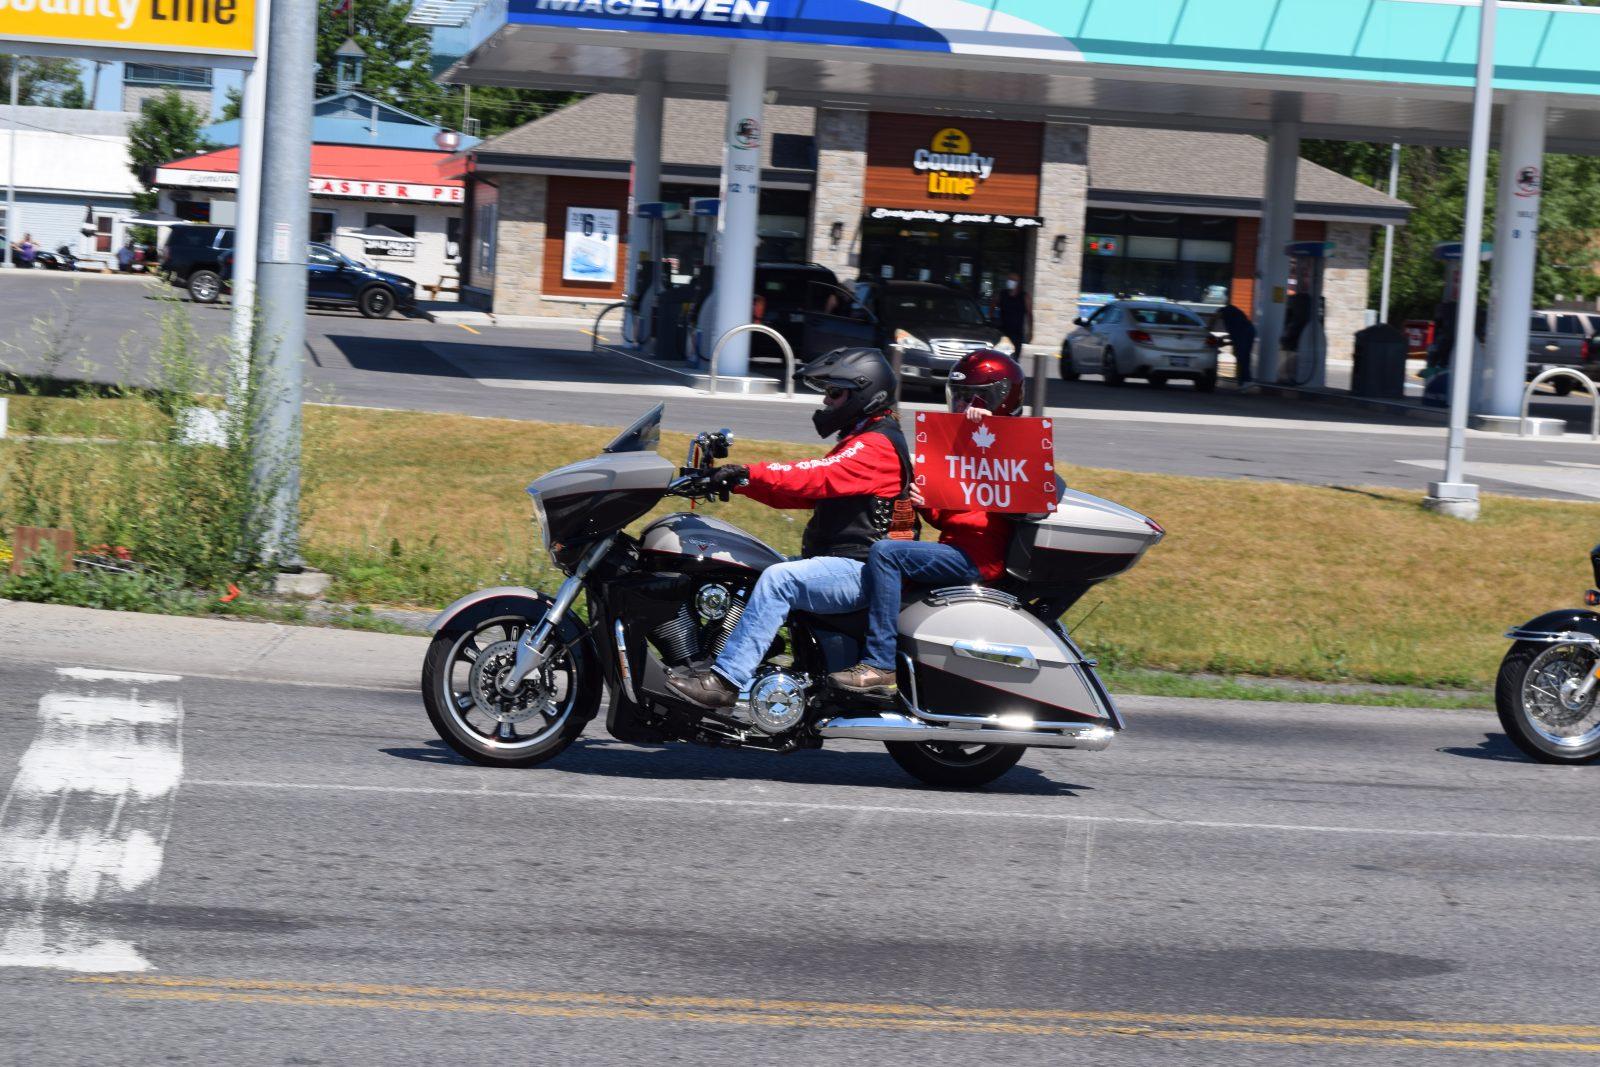 SLIDESHOW: Honour Ride through rural communities